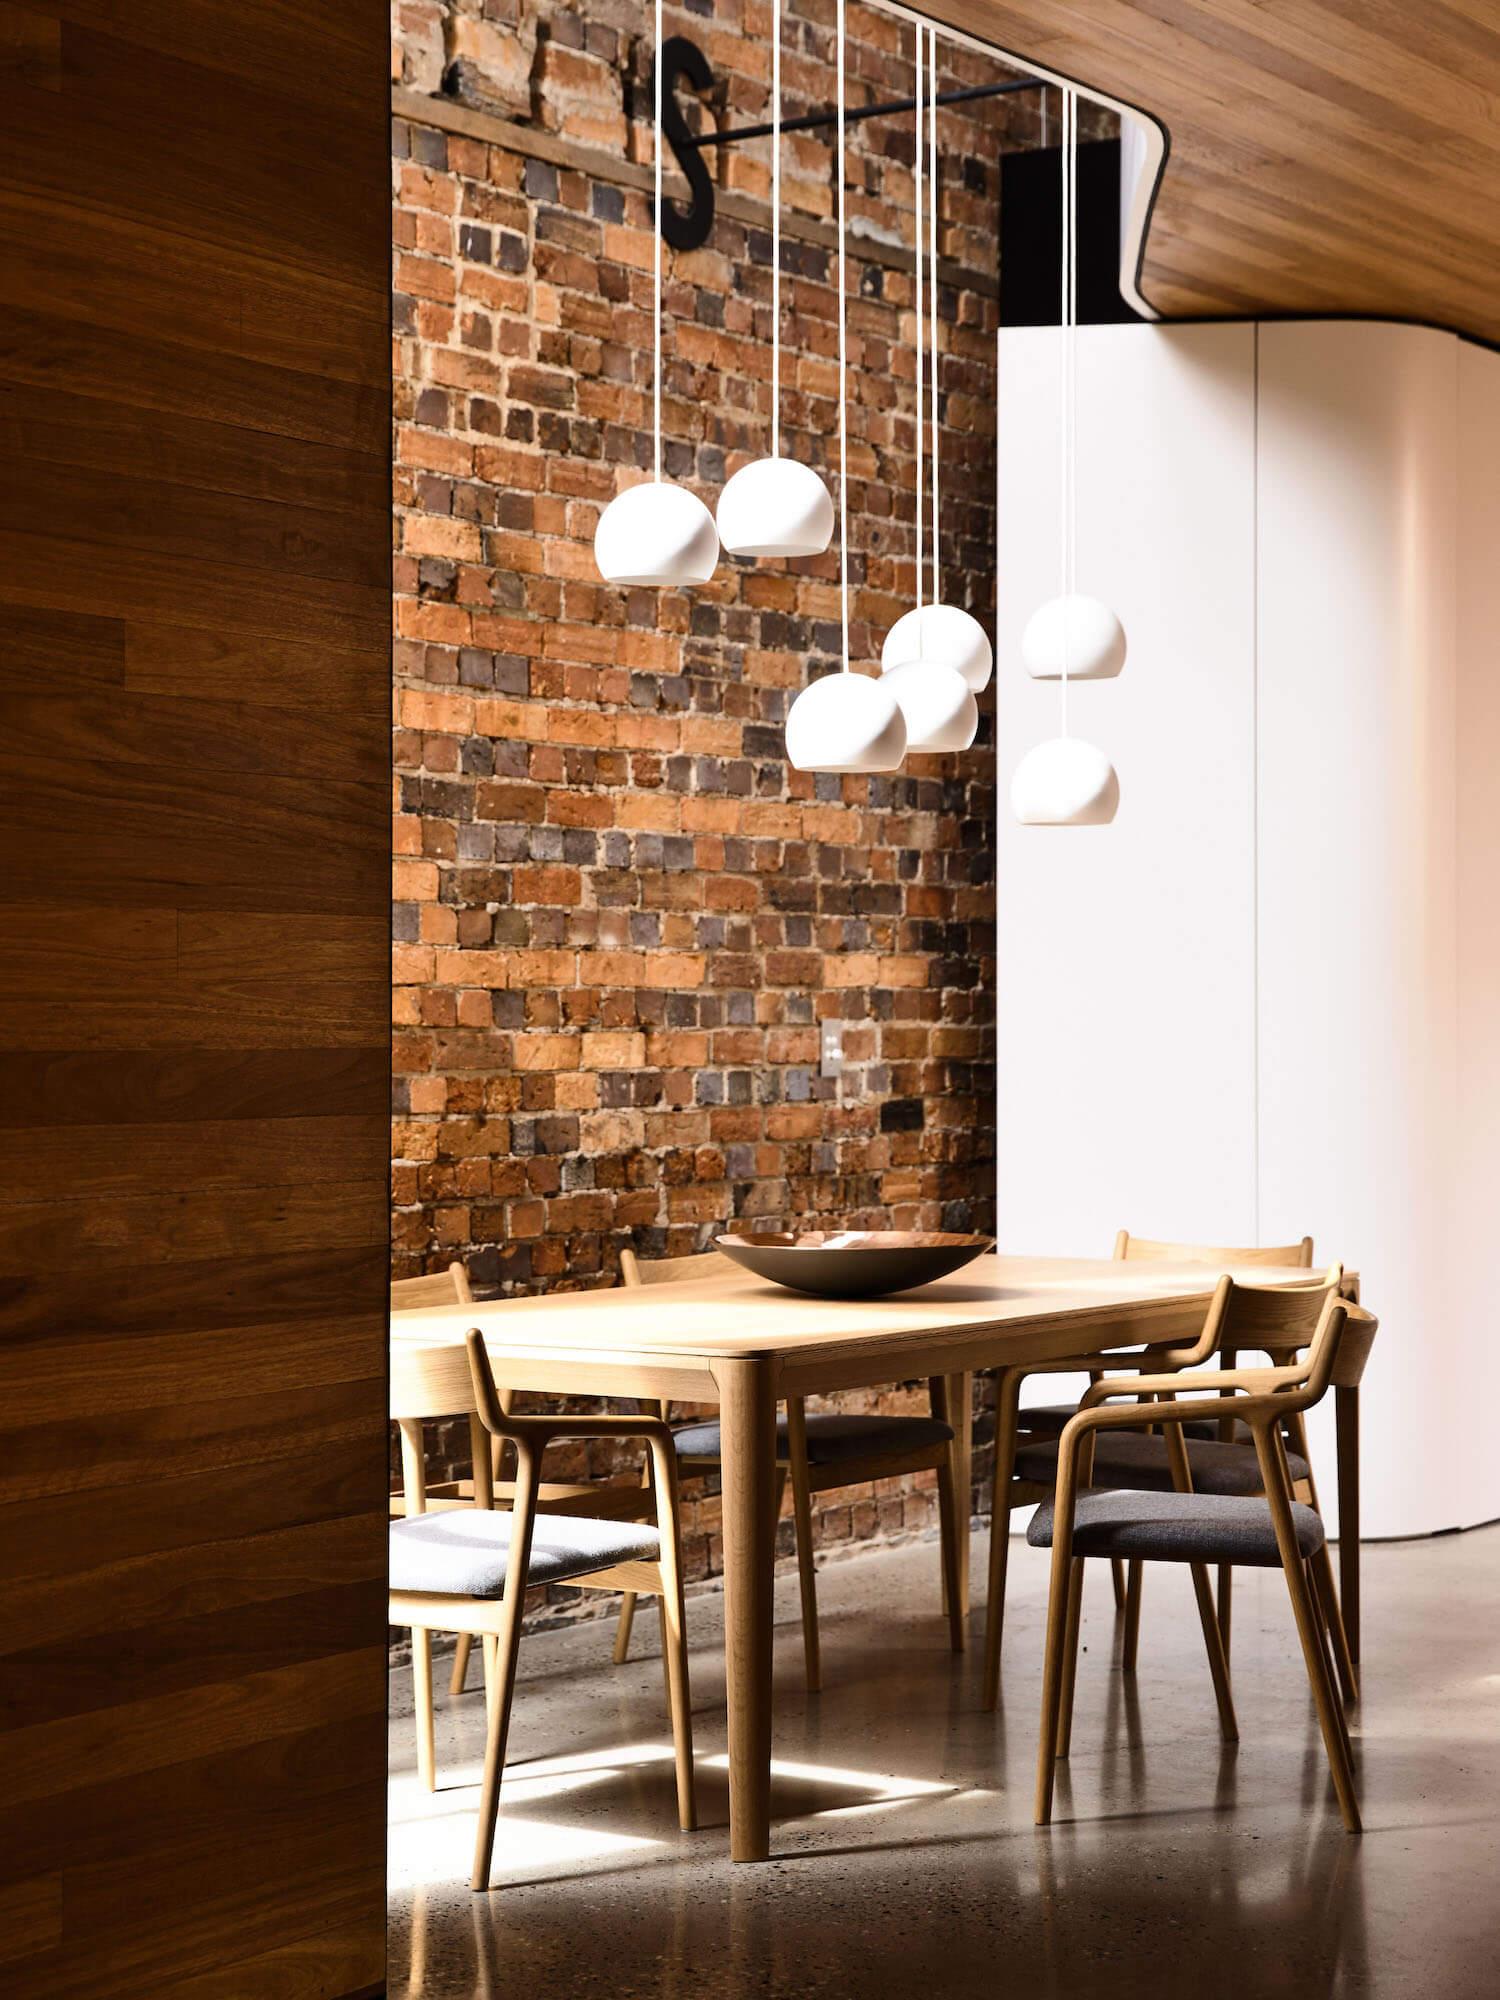 est living interview matt gibson architecture and design 6